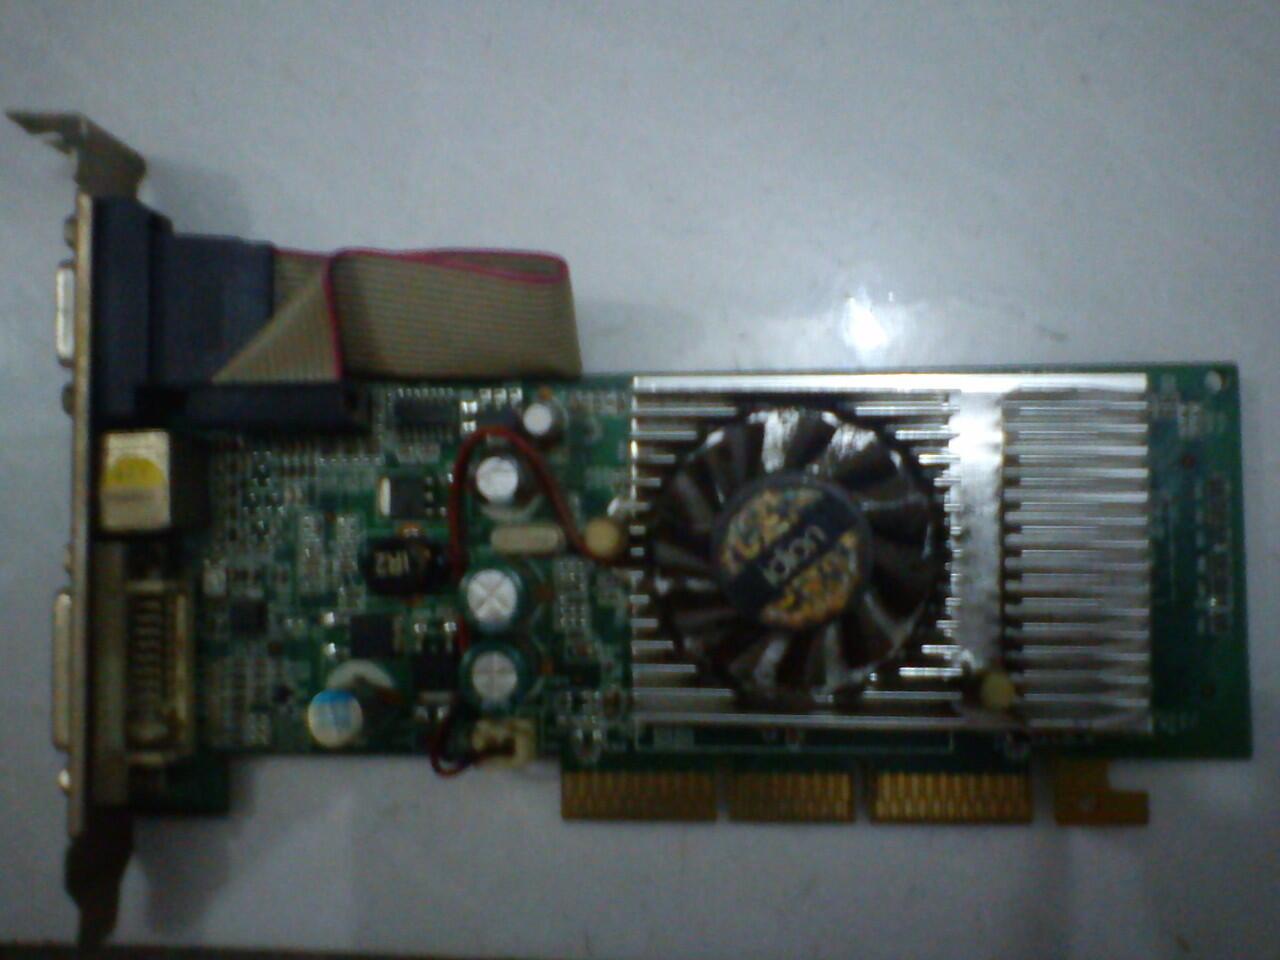 VGA AGP GeForce 6200 256MB 128bit